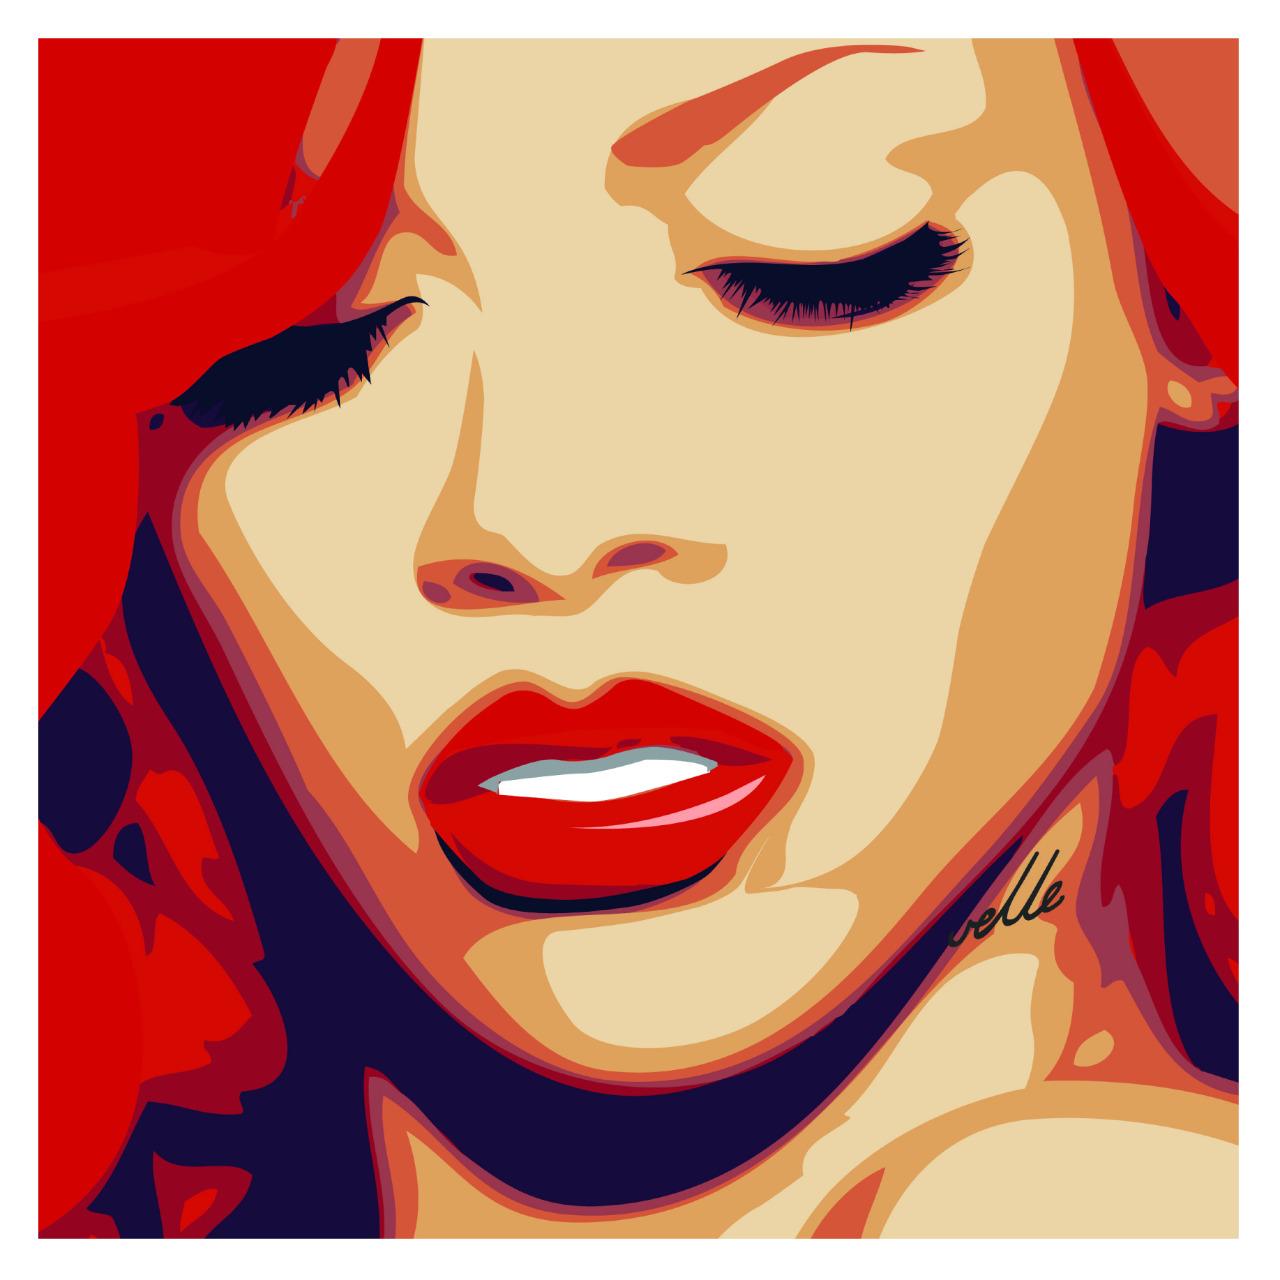 http://24.media.tumblr.com/e7306aa50cf90166ab1567411a1d3e90/tumblr_mf1mbut2ED1r61og5o1_1280.jpg